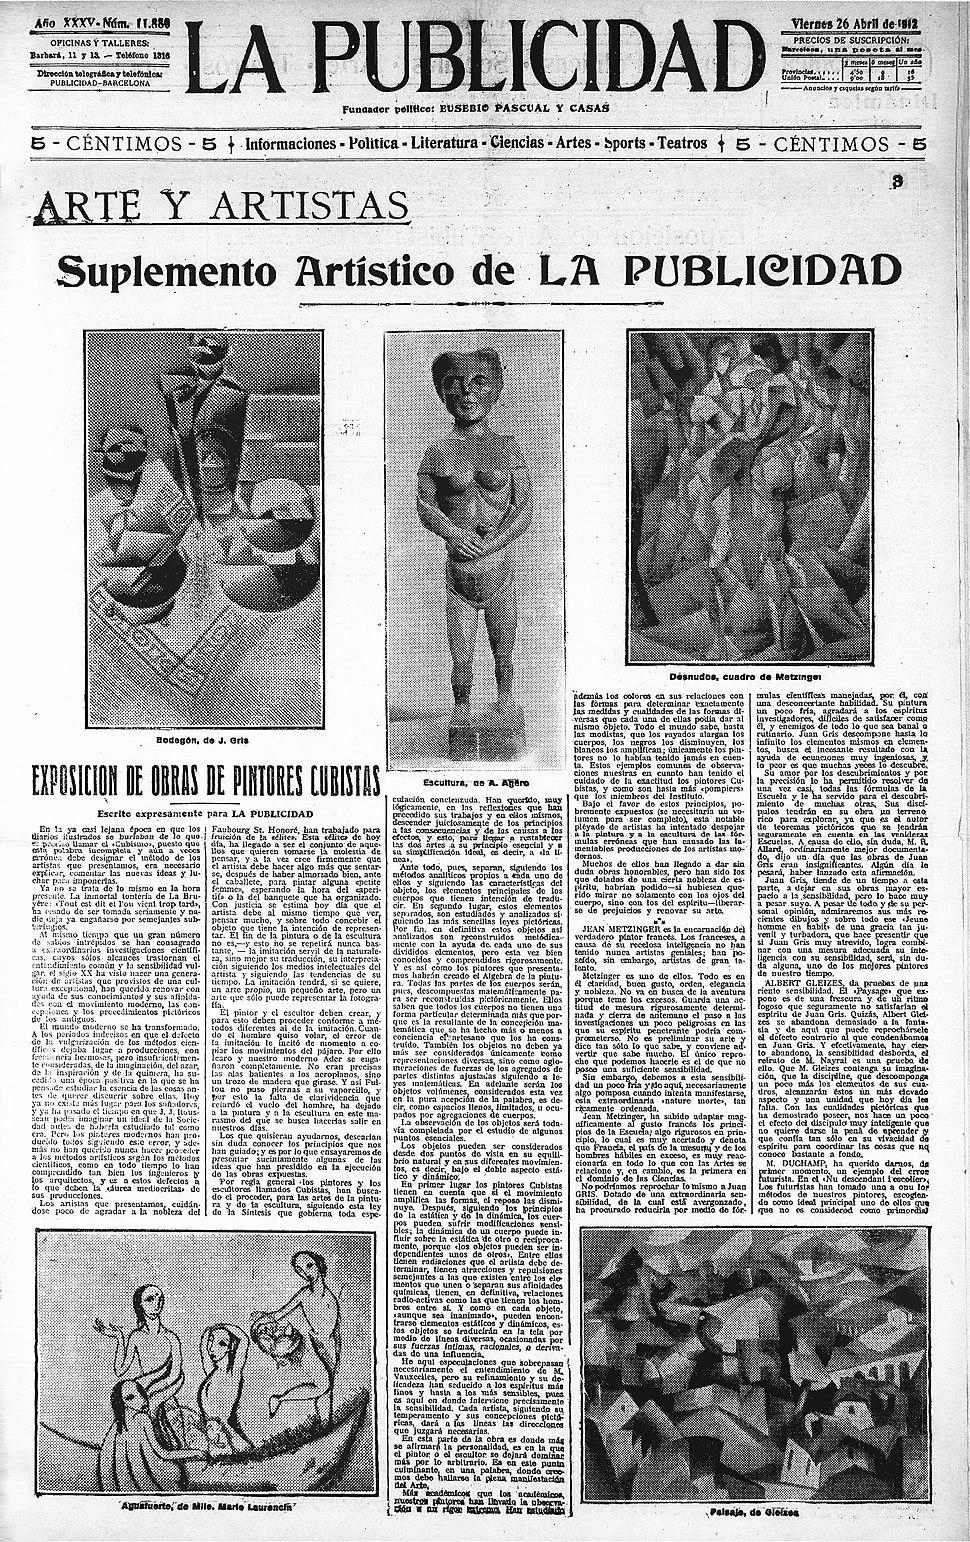 Juan Gris, August Agero, Jean Metzinger, Marie Laurencin, Albert Gleizes, La Publicidad, 26 April 1912